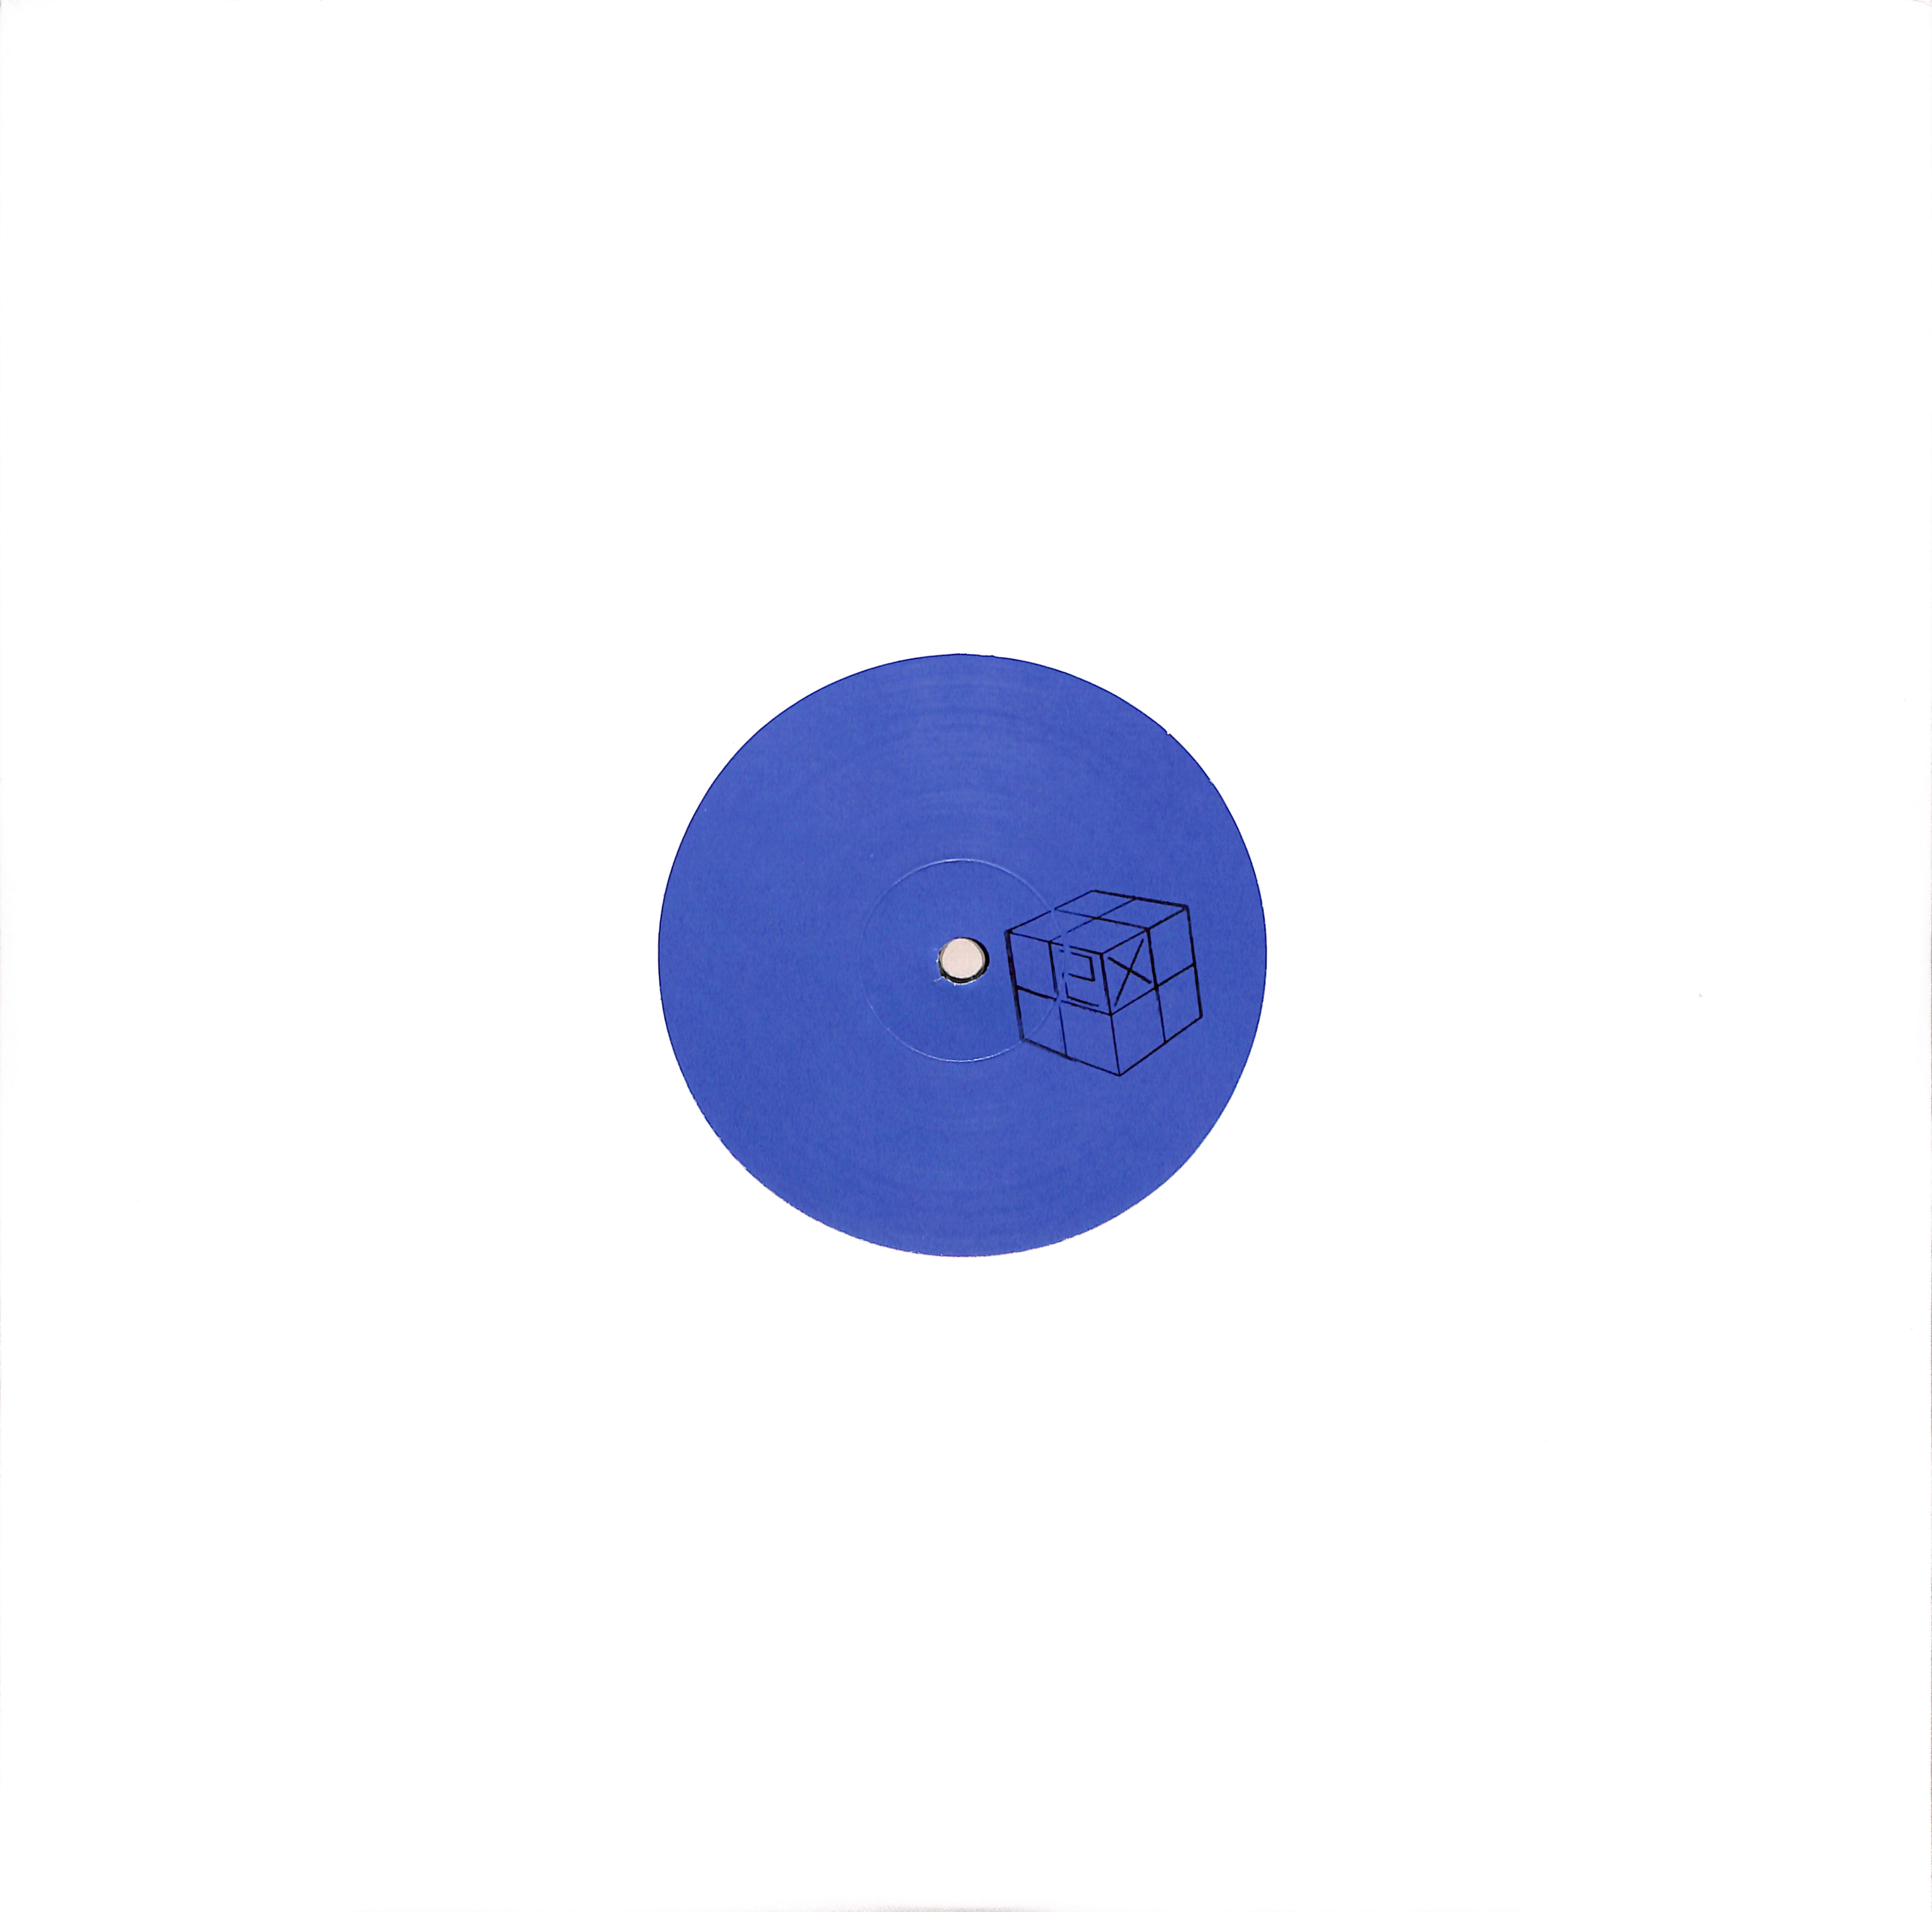 Taslo Valve & Bowyer - 2XBLUE